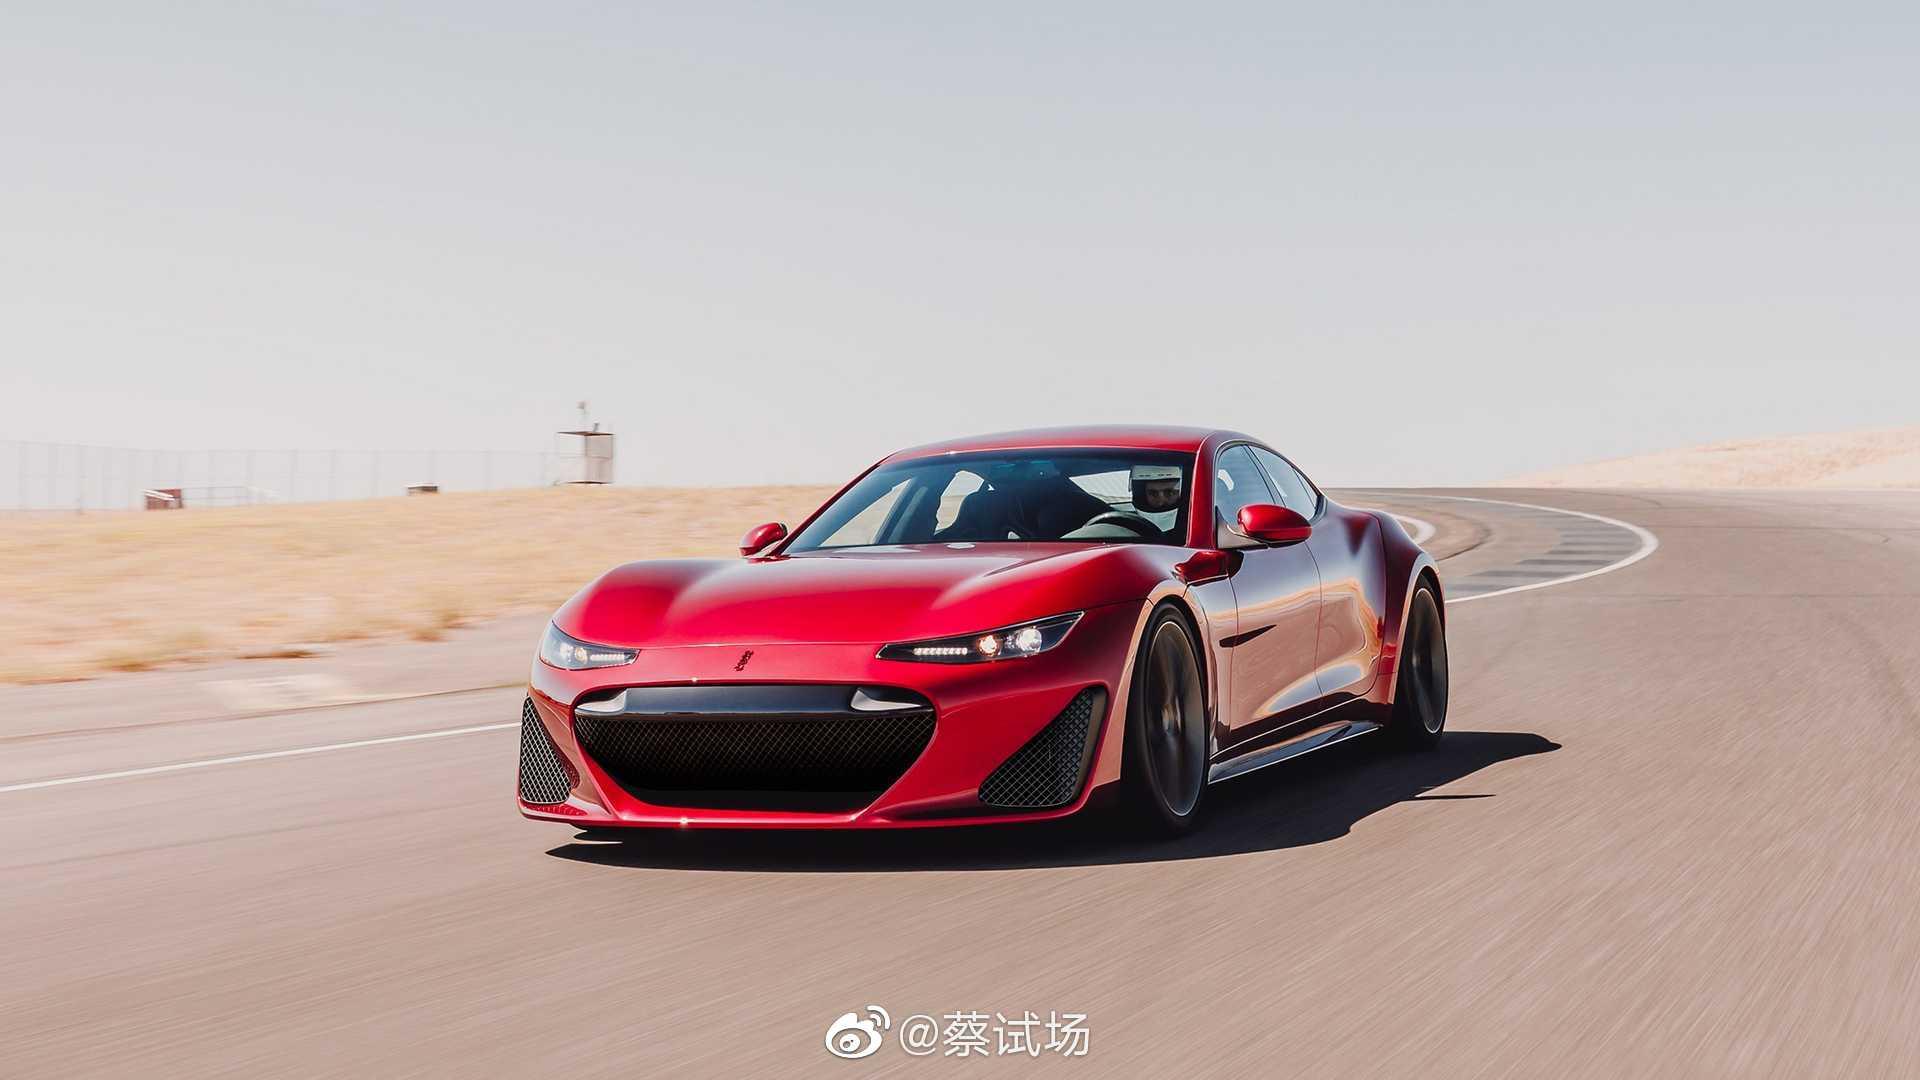 Drako GTE电动GT发布:硅谷车企Drako推出电动4座GT,命名GTE